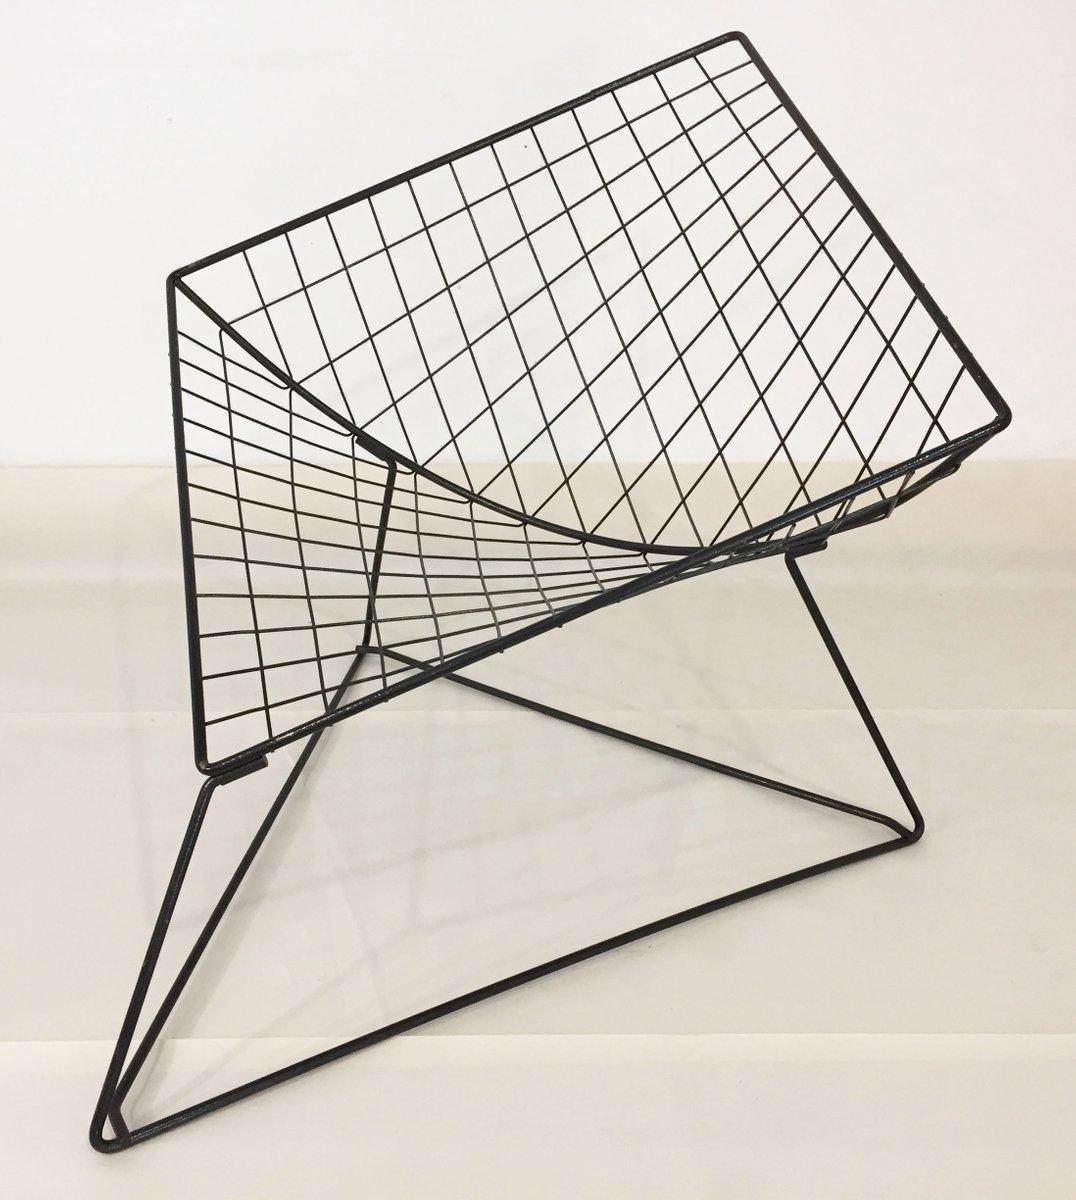 modell oti drahtgeflecht st hle von j rgen gammelgaard f r ikea 1986 bei pamono kaufen. Black Bedroom Furniture Sets. Home Design Ideas